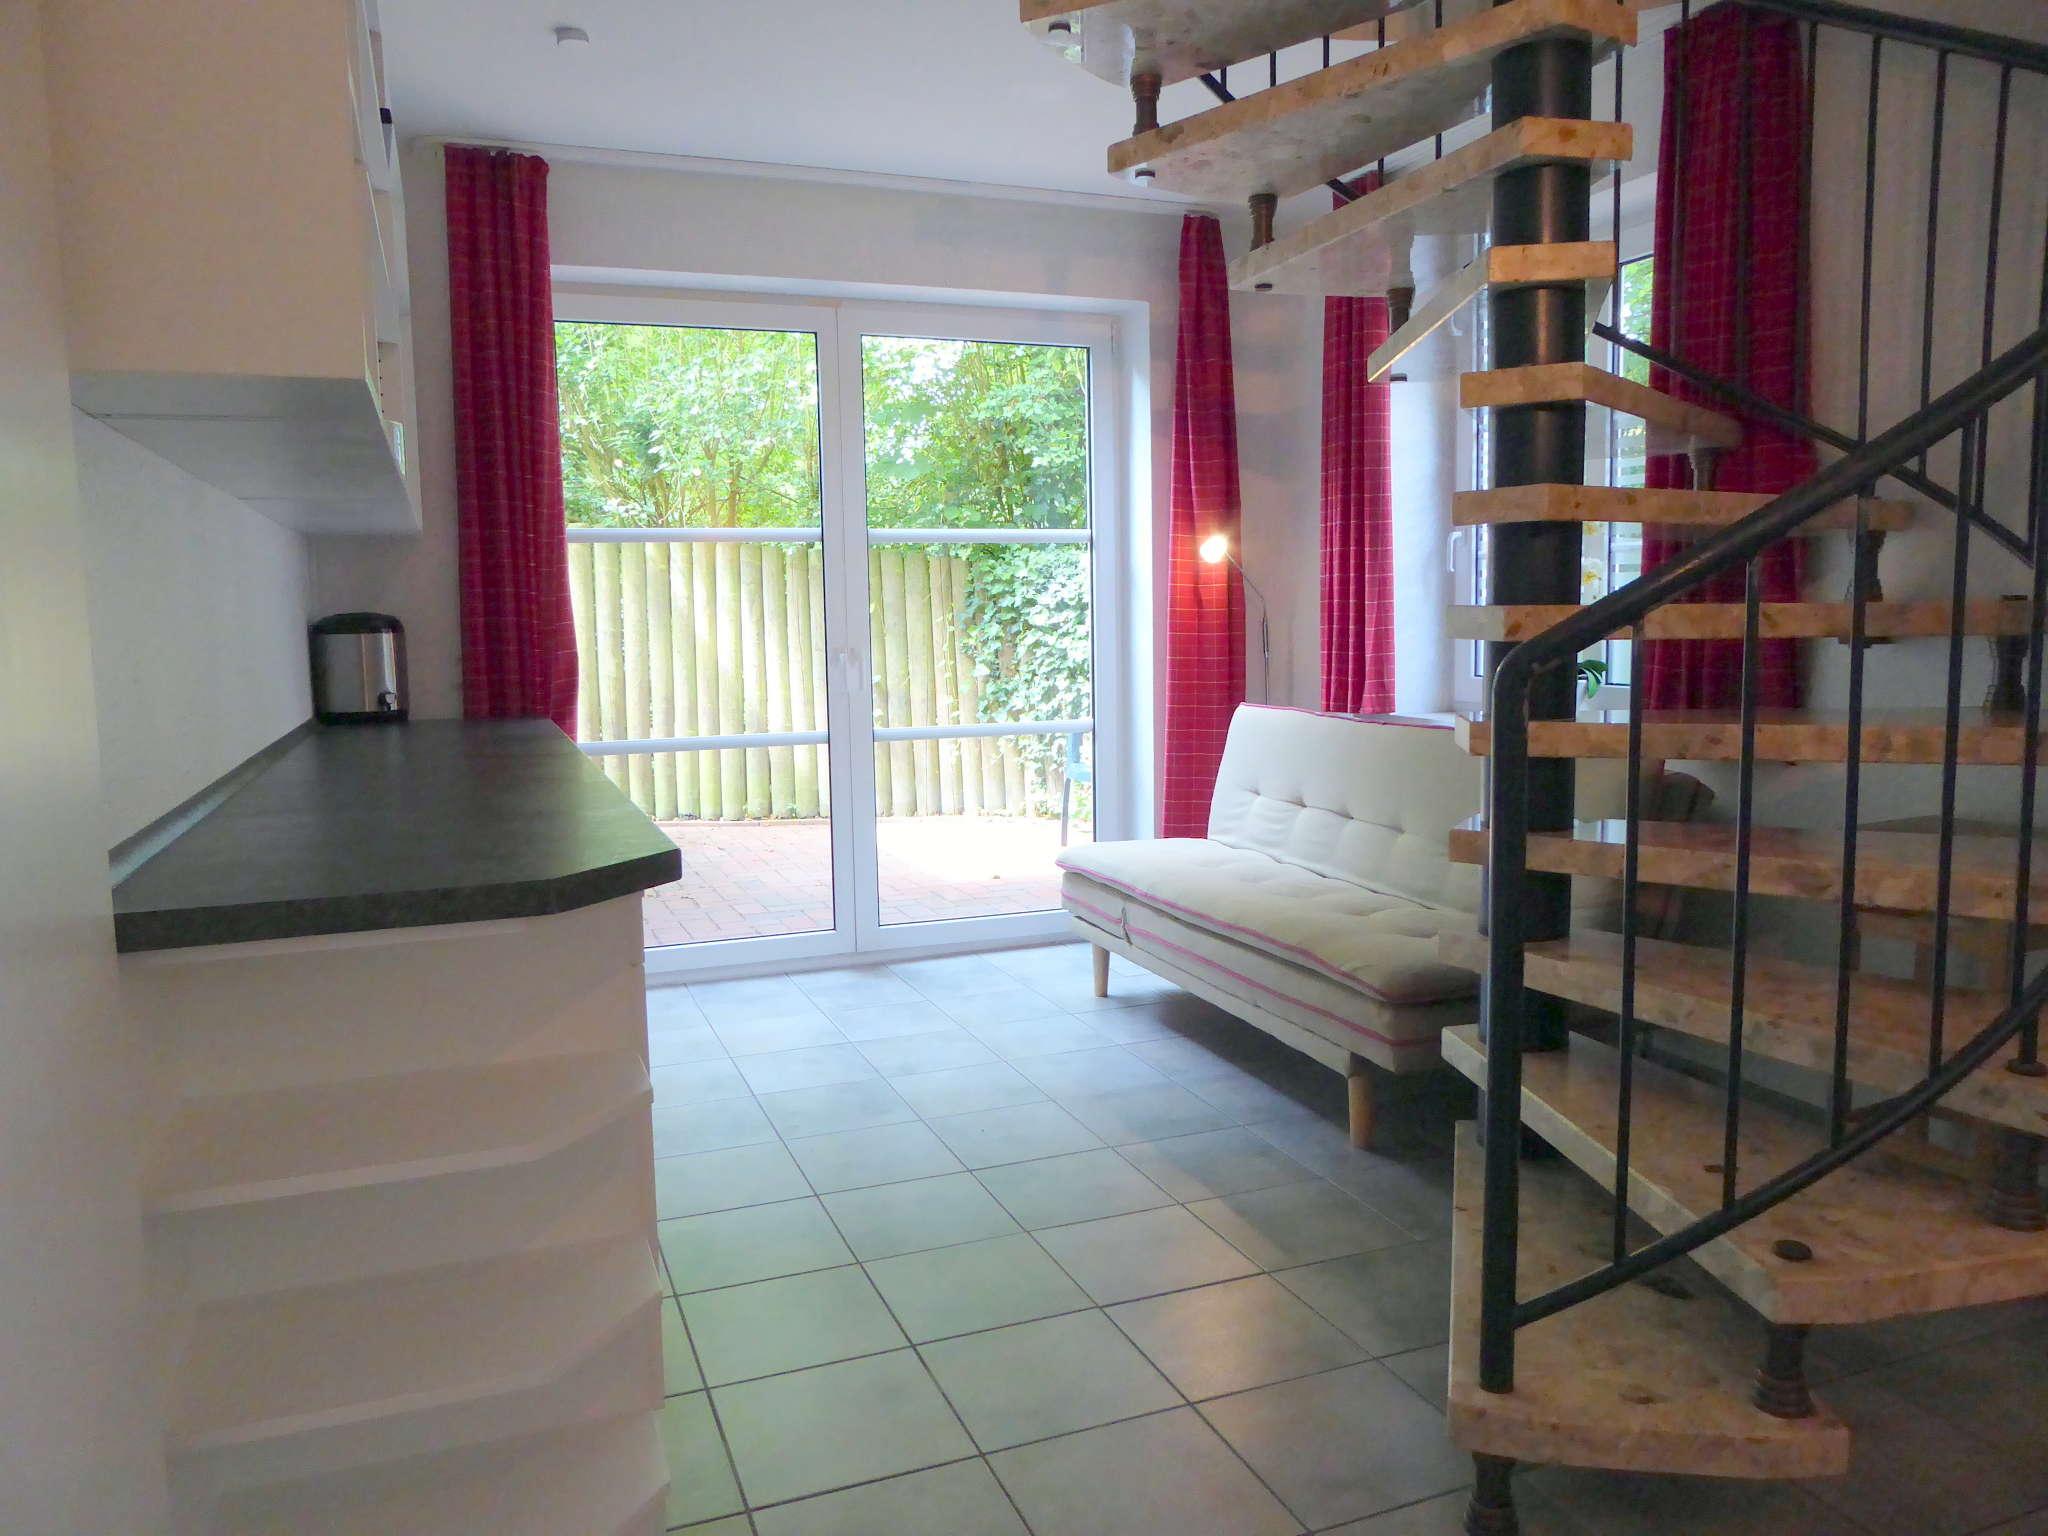 Lounge-Ecke m. Terrasse u. Treppe zum OG